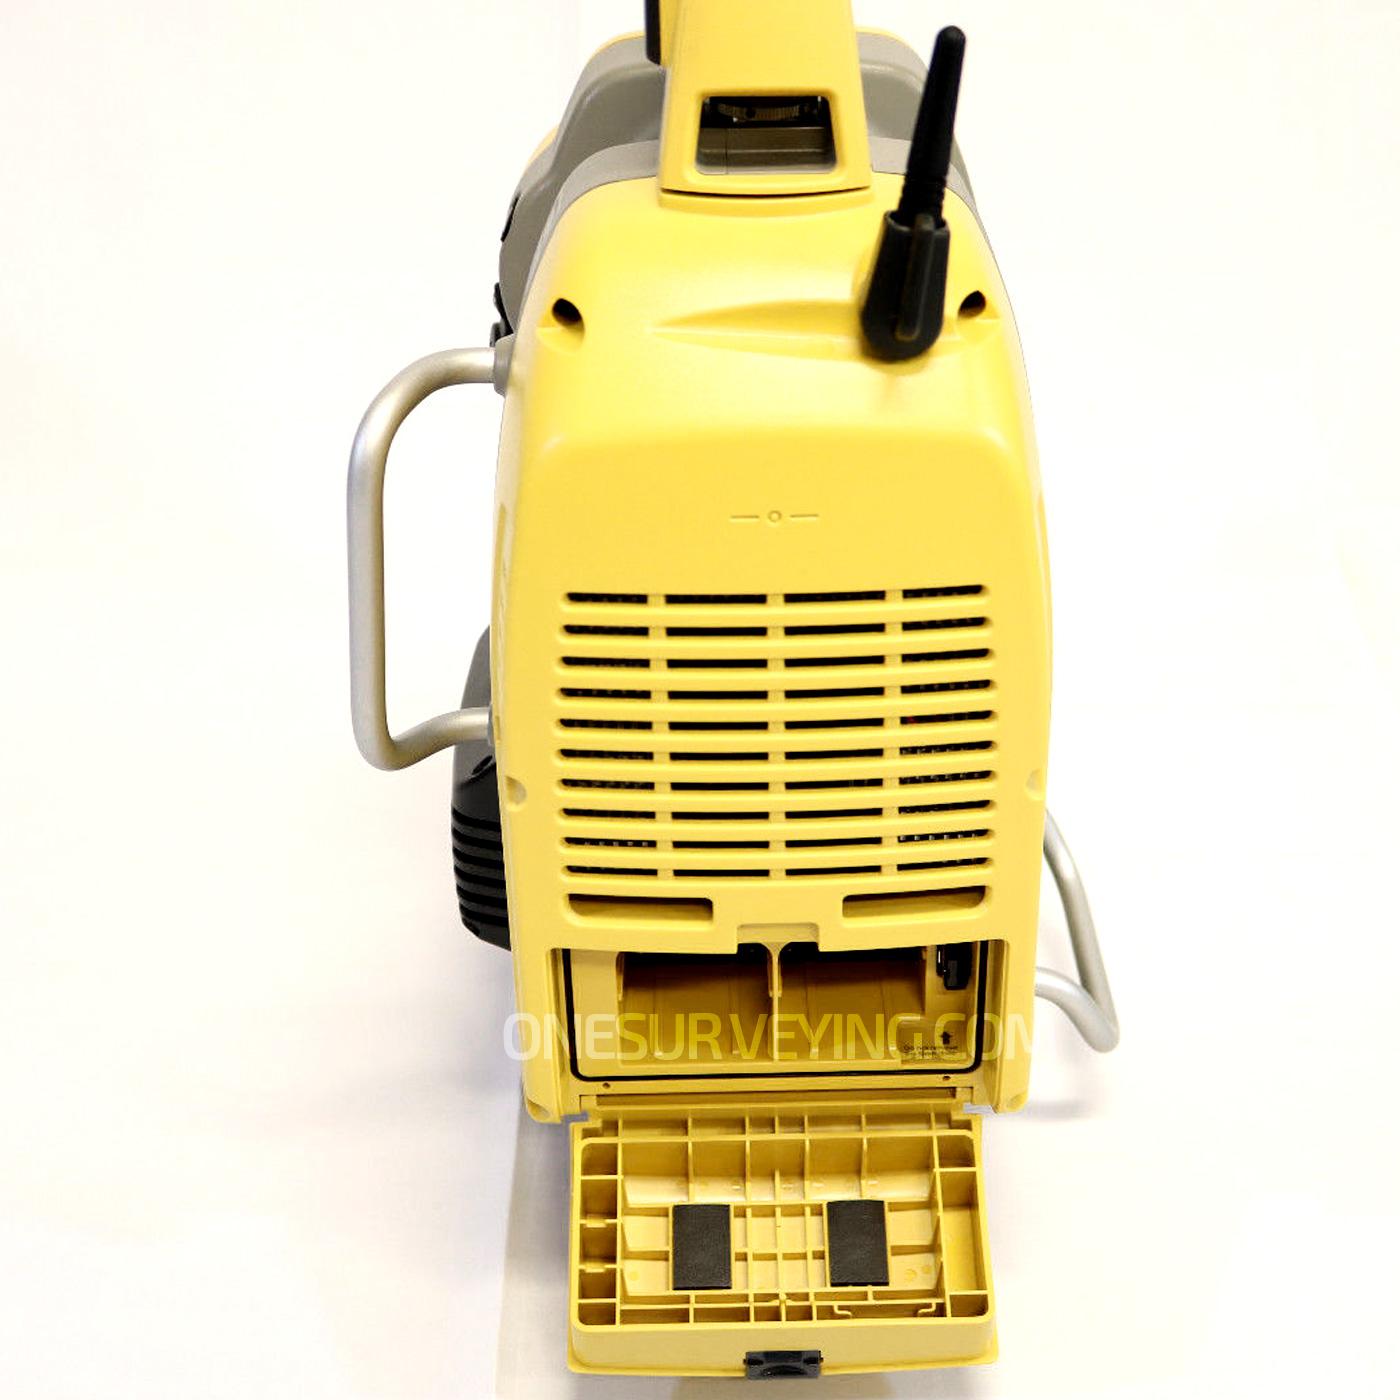 Used-Topcon-GLS-2000S-Price.jpg